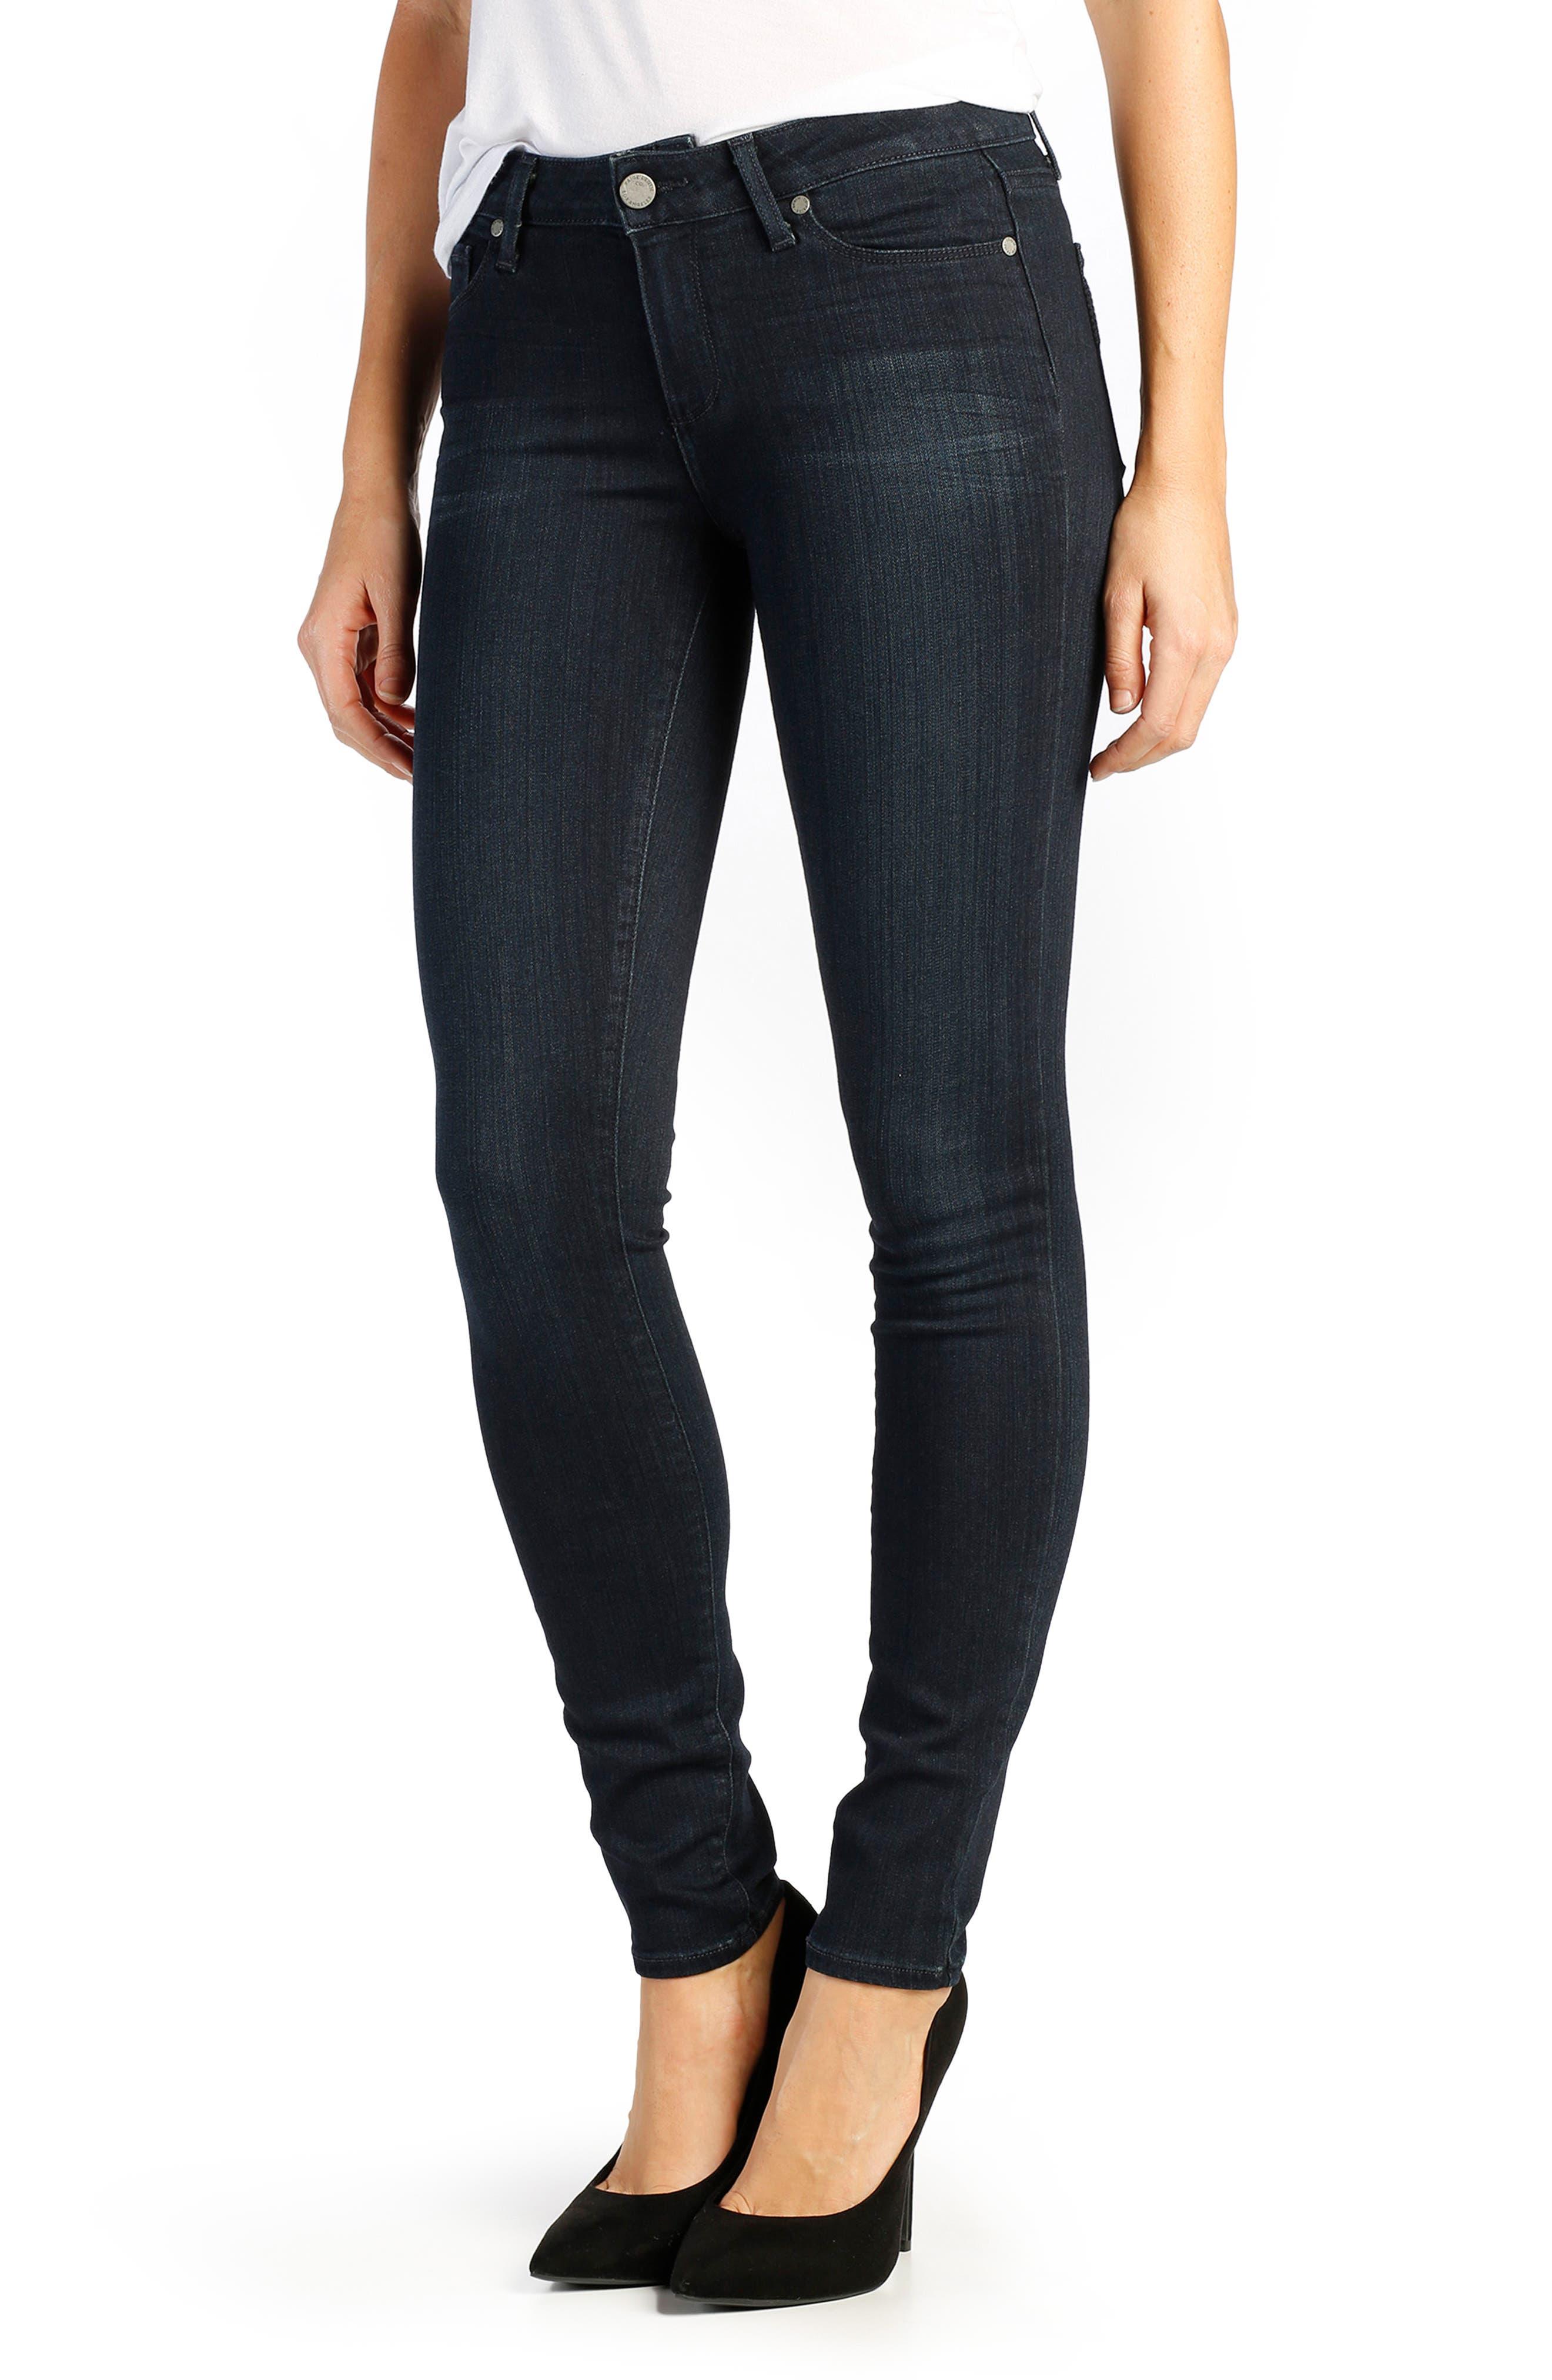 PAIGE Transcend - Verdugo Ultra Skinny Jeans (Total Mona)